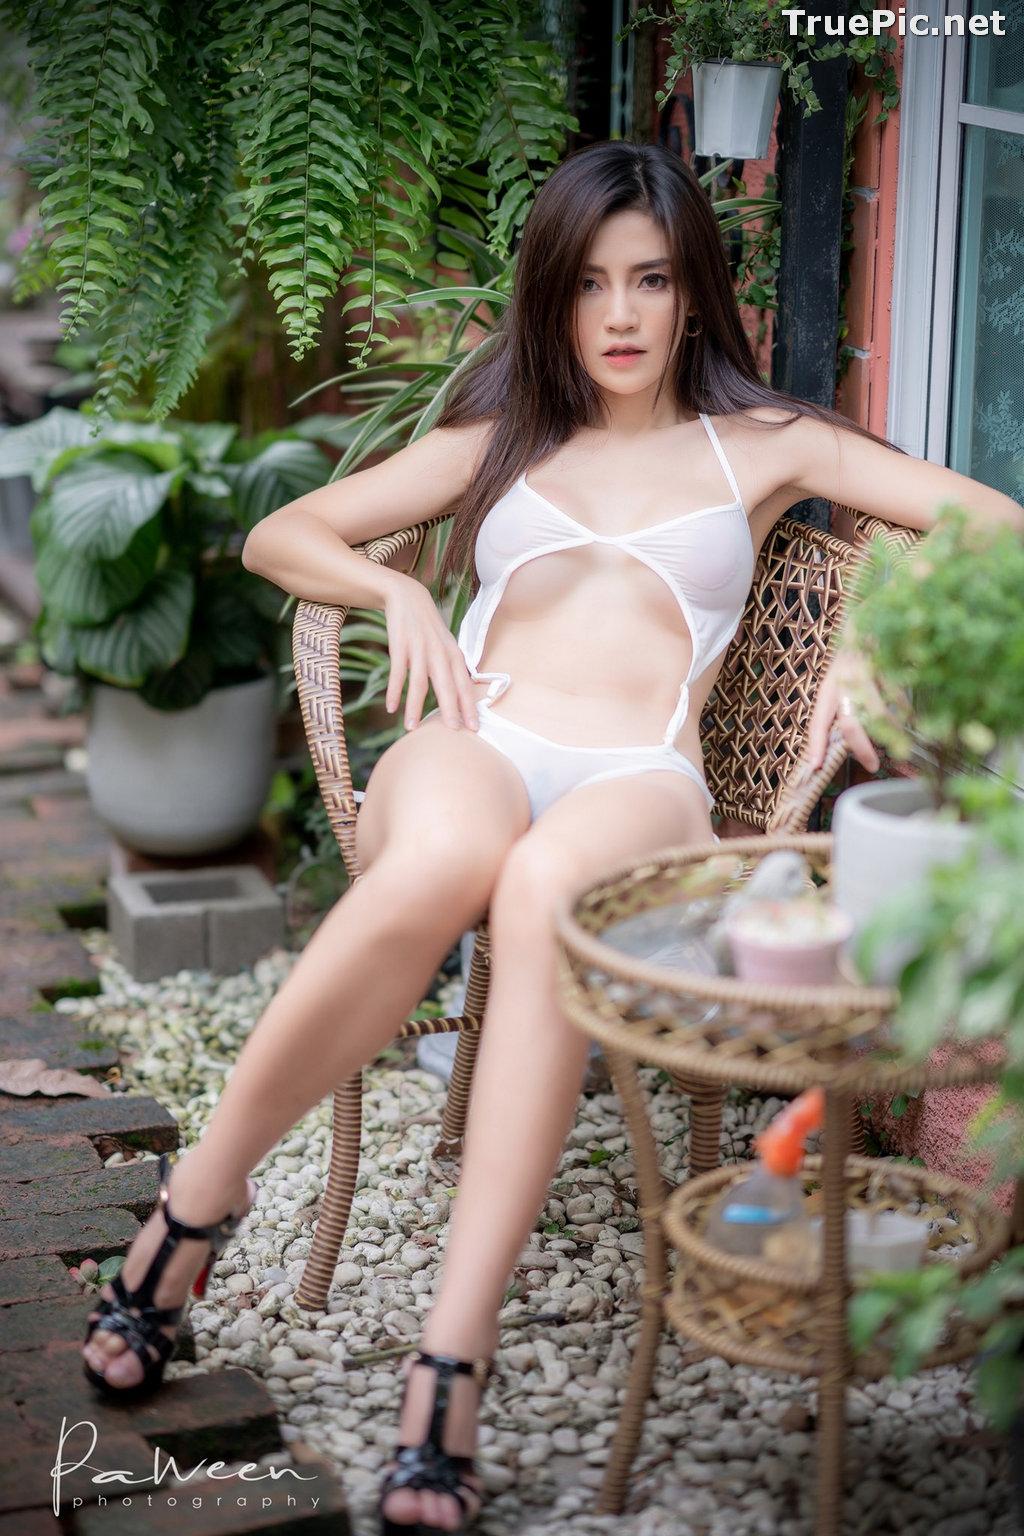 Image Thailand Model - Ladapa Ratchataamonchot - Sexy Garden - TruePic.net - Picture-10